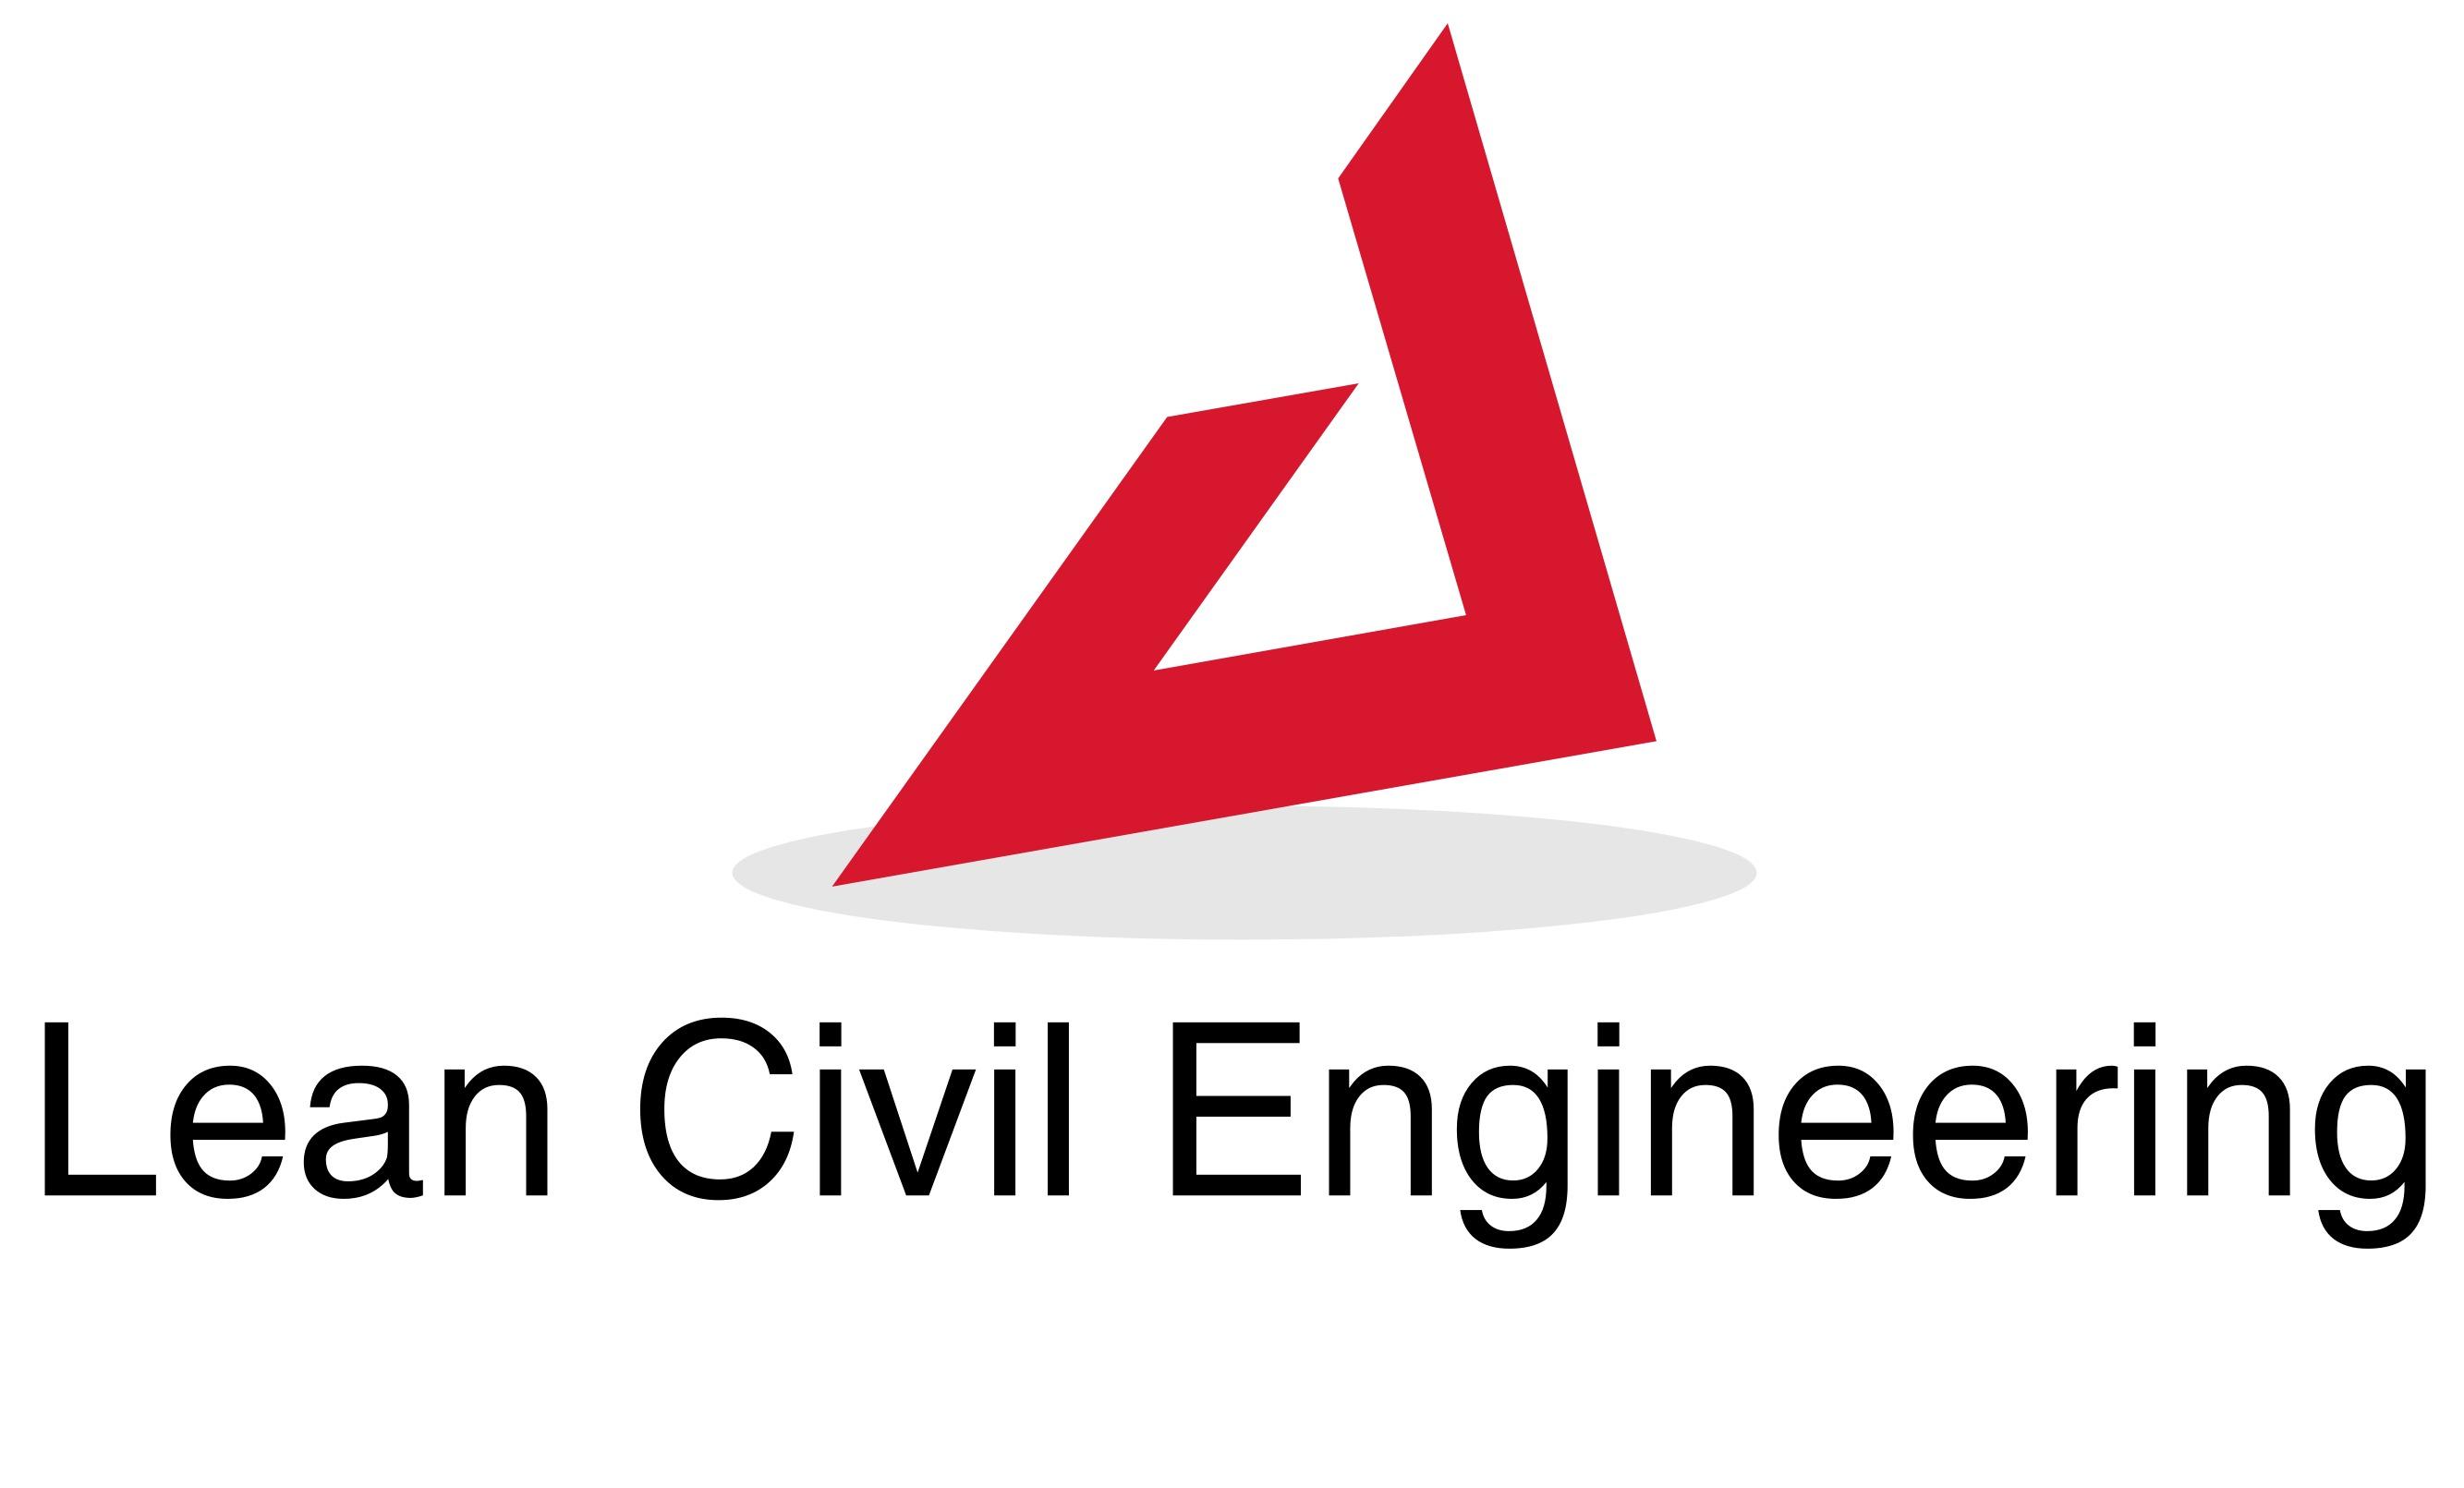 Lean Civil Engineering Limited